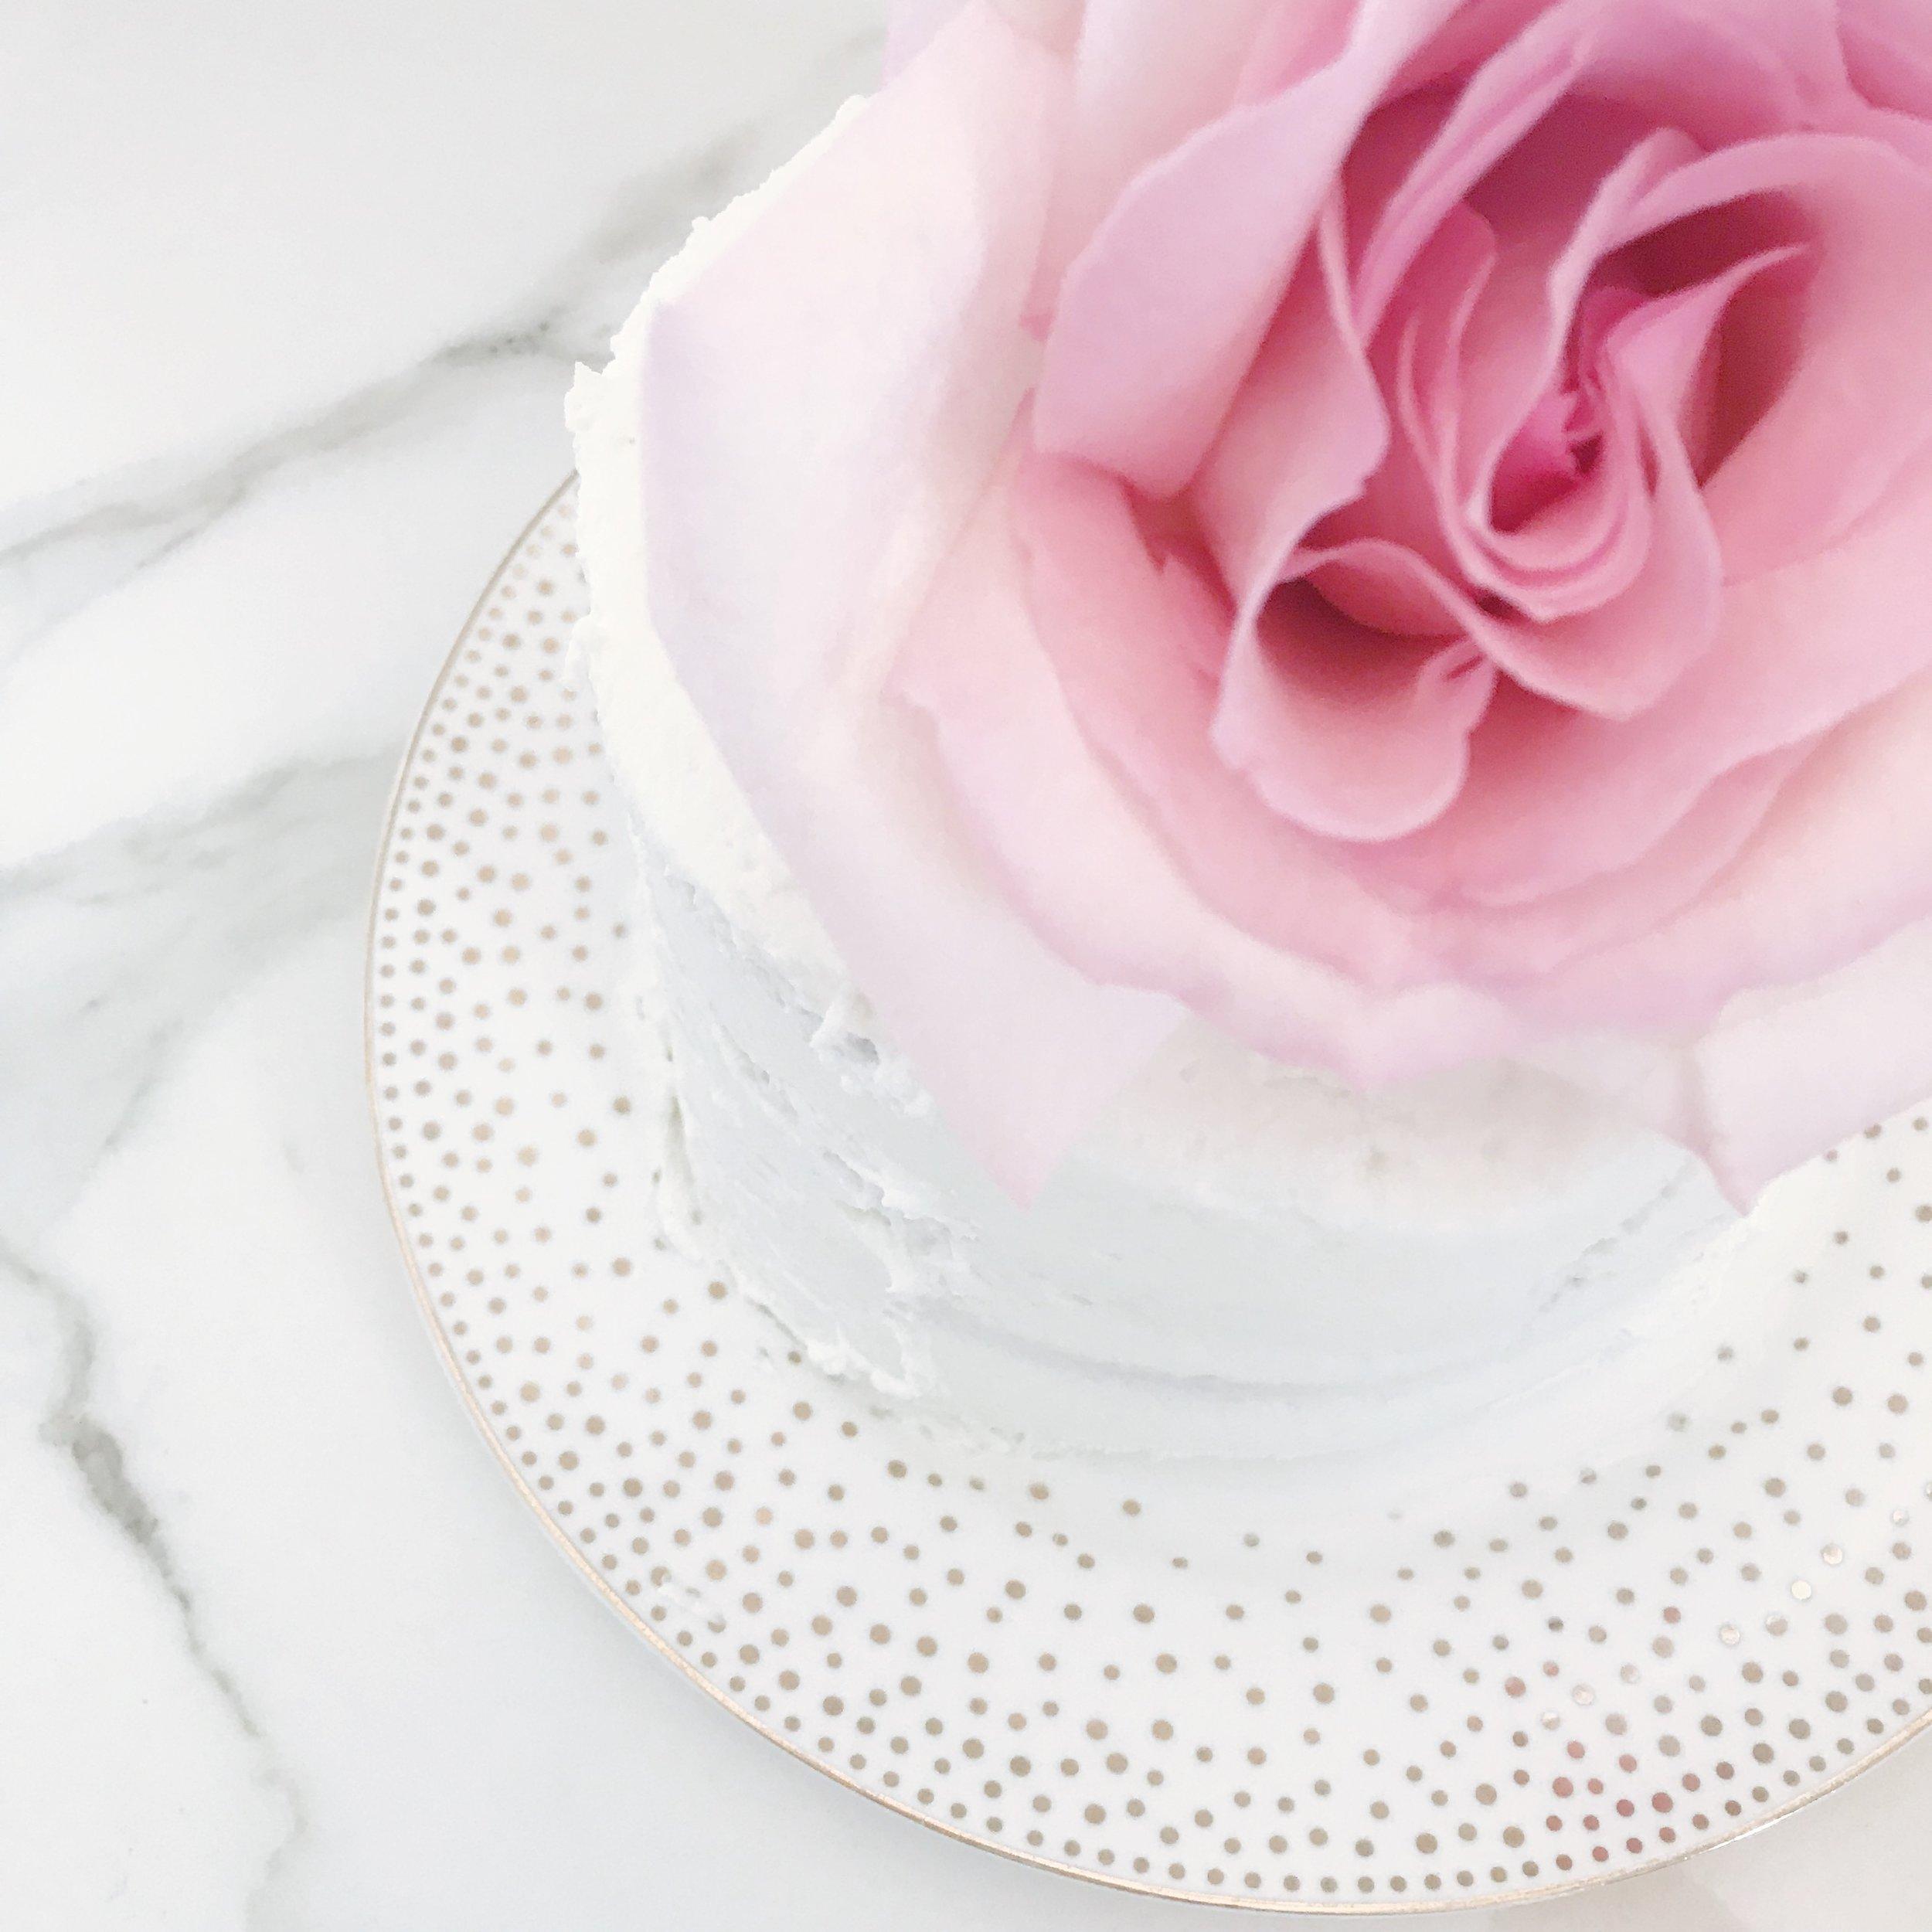 THE-CAROLINE-DOLL-BLOG-WEDDING-CAKE-PRESERVATION-3.JPG